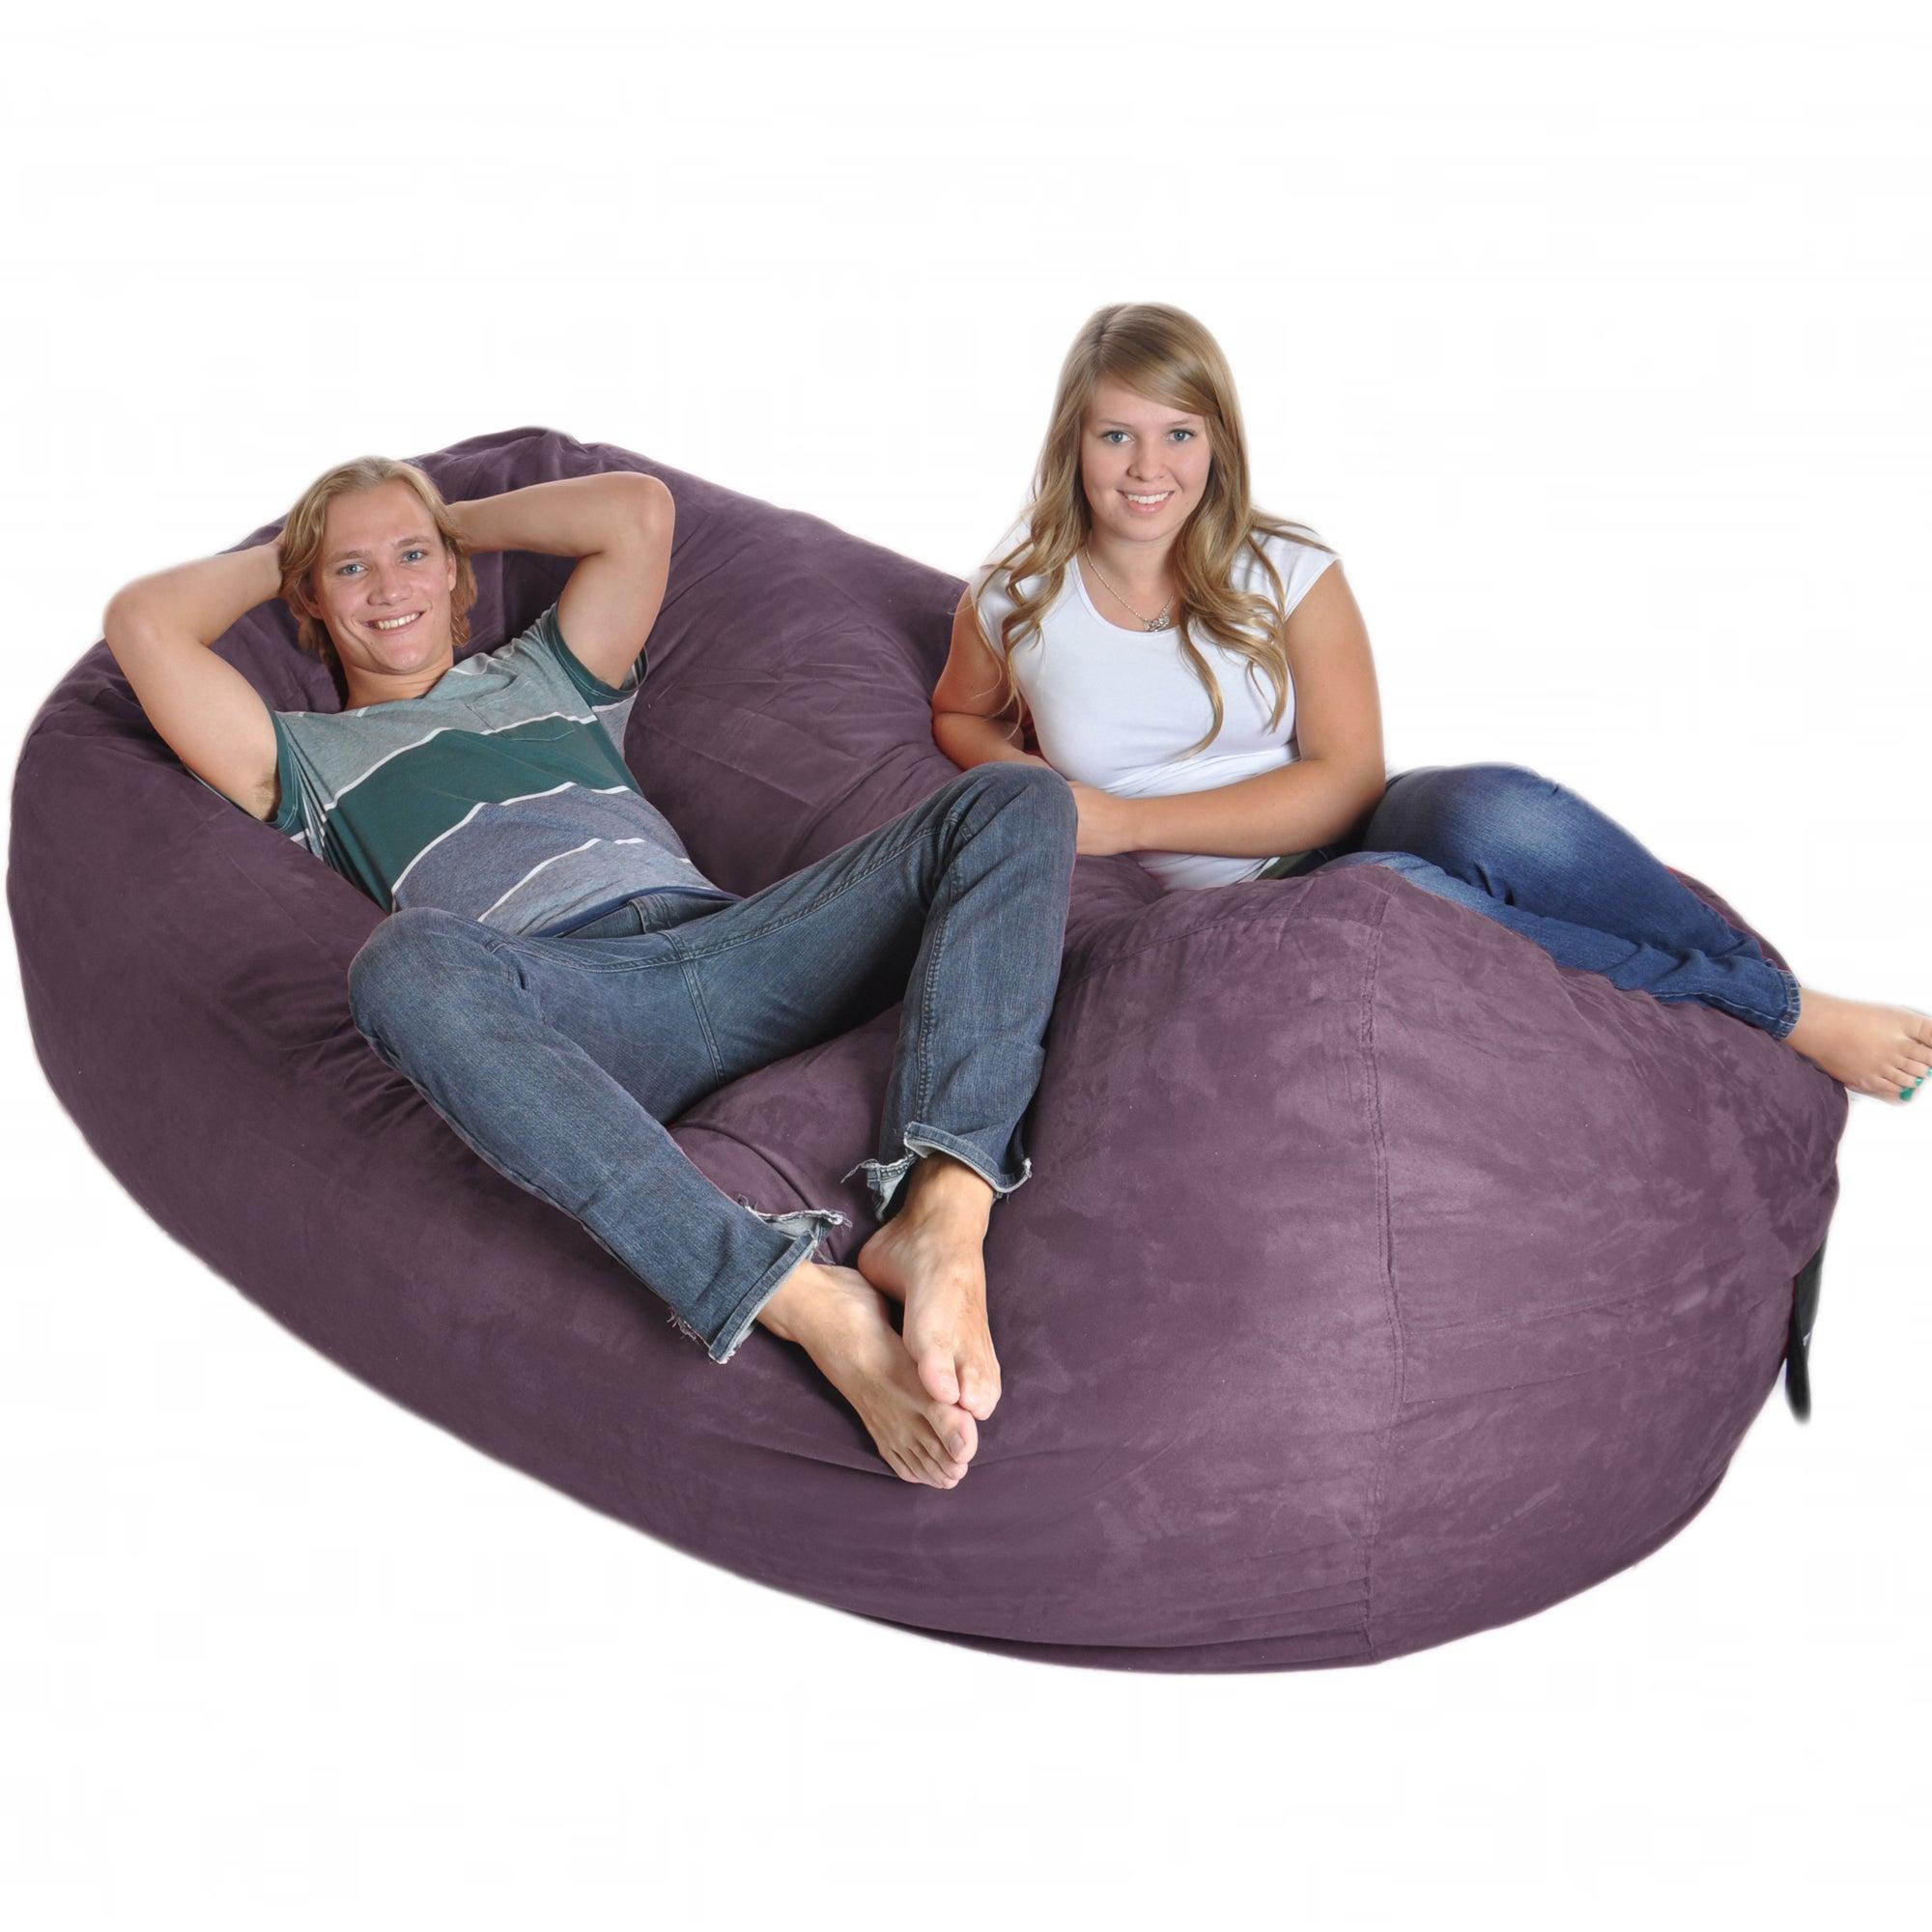 Sensational Purple 8 Foot Oval Microfiber Memory Foam Bean Bag Squirreltailoven Fun Painted Chair Ideas Images Squirreltailovenorg